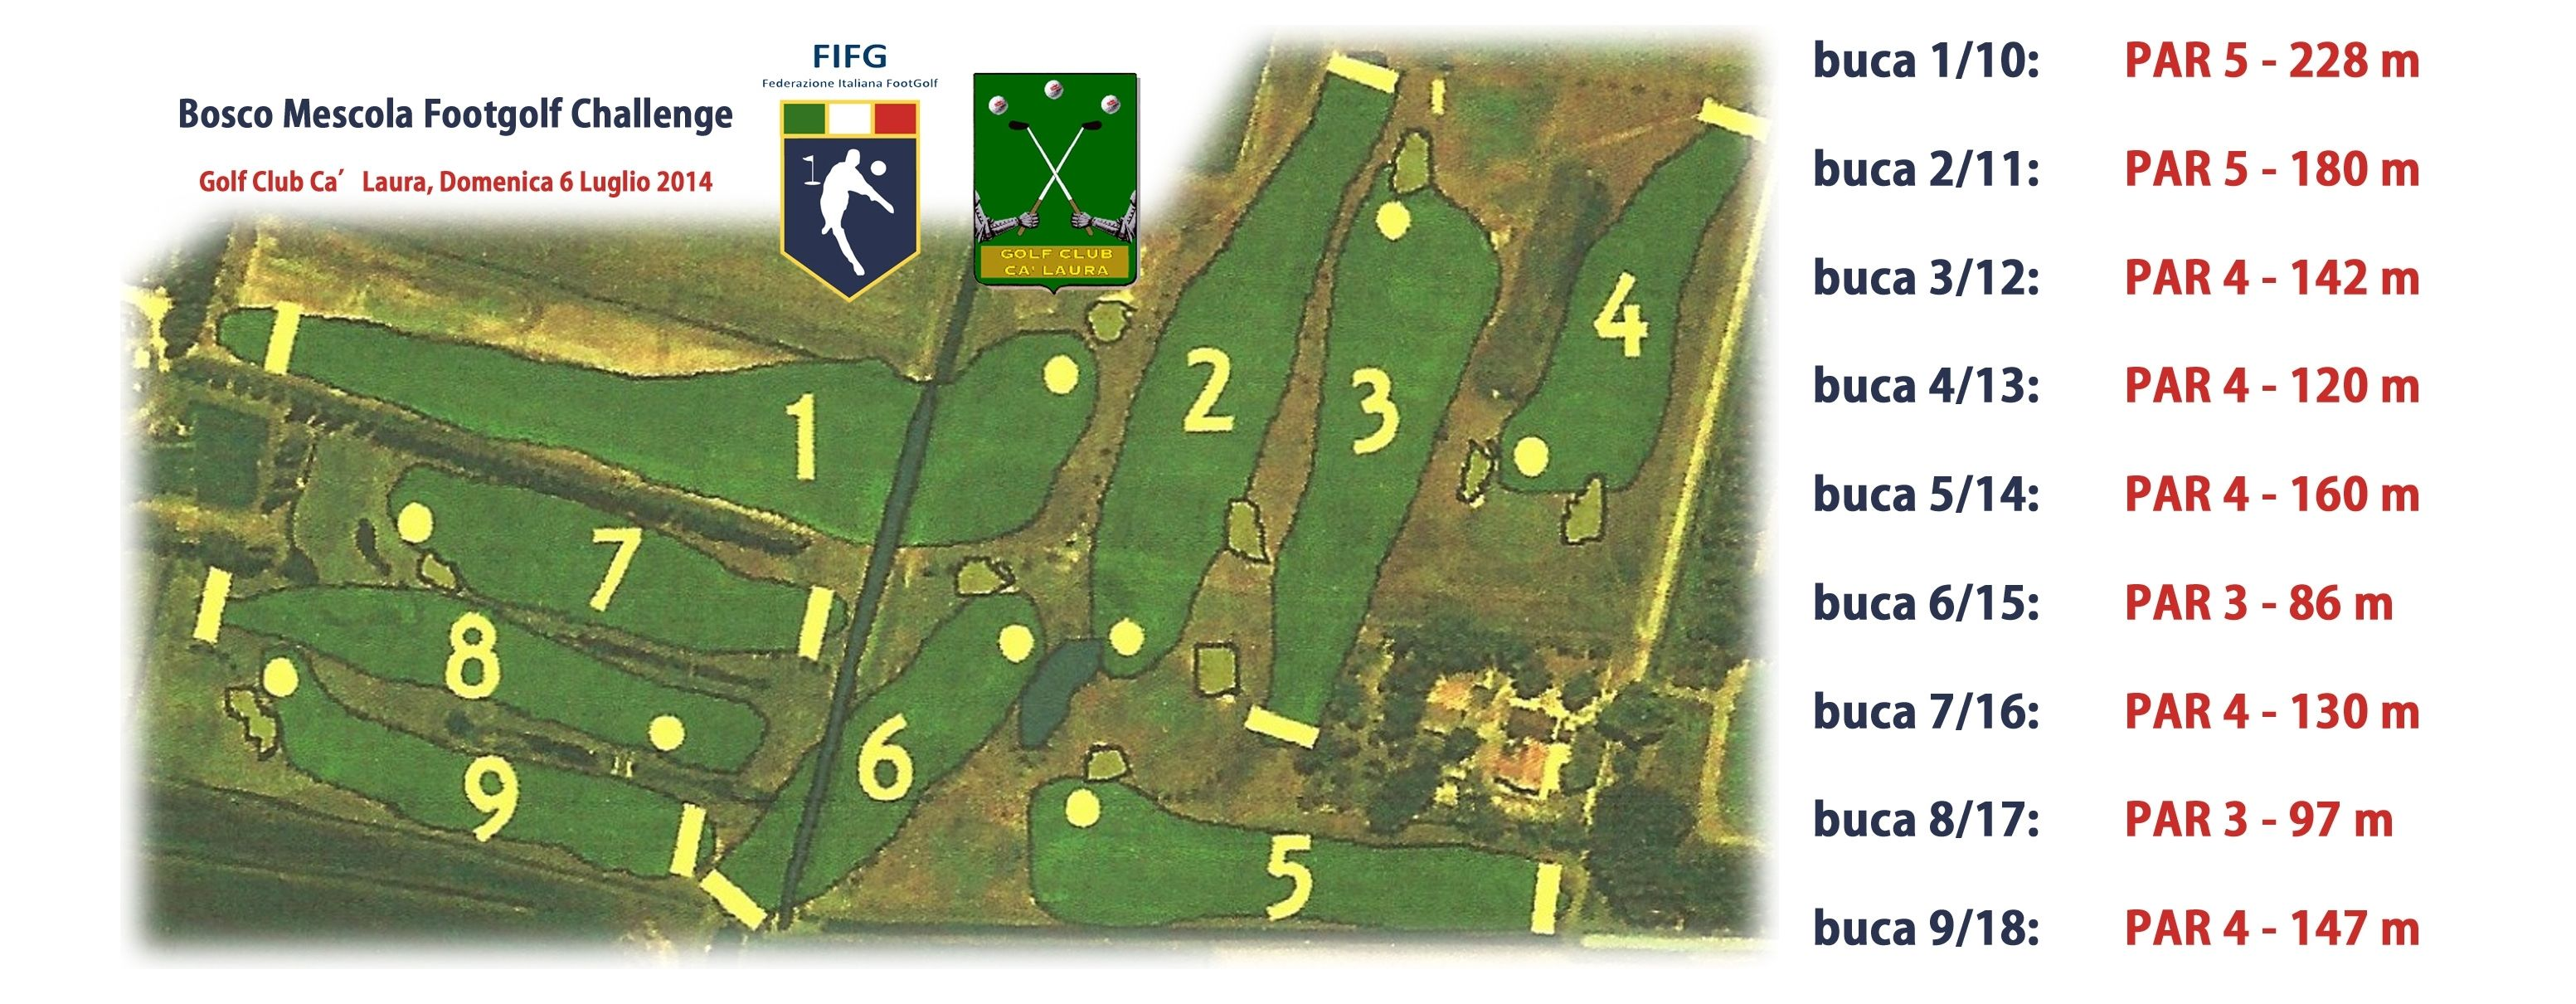 Percorso di gara #footgolf 18 buche del Golf Club Cà Laura Ferrara @Federfootgolf